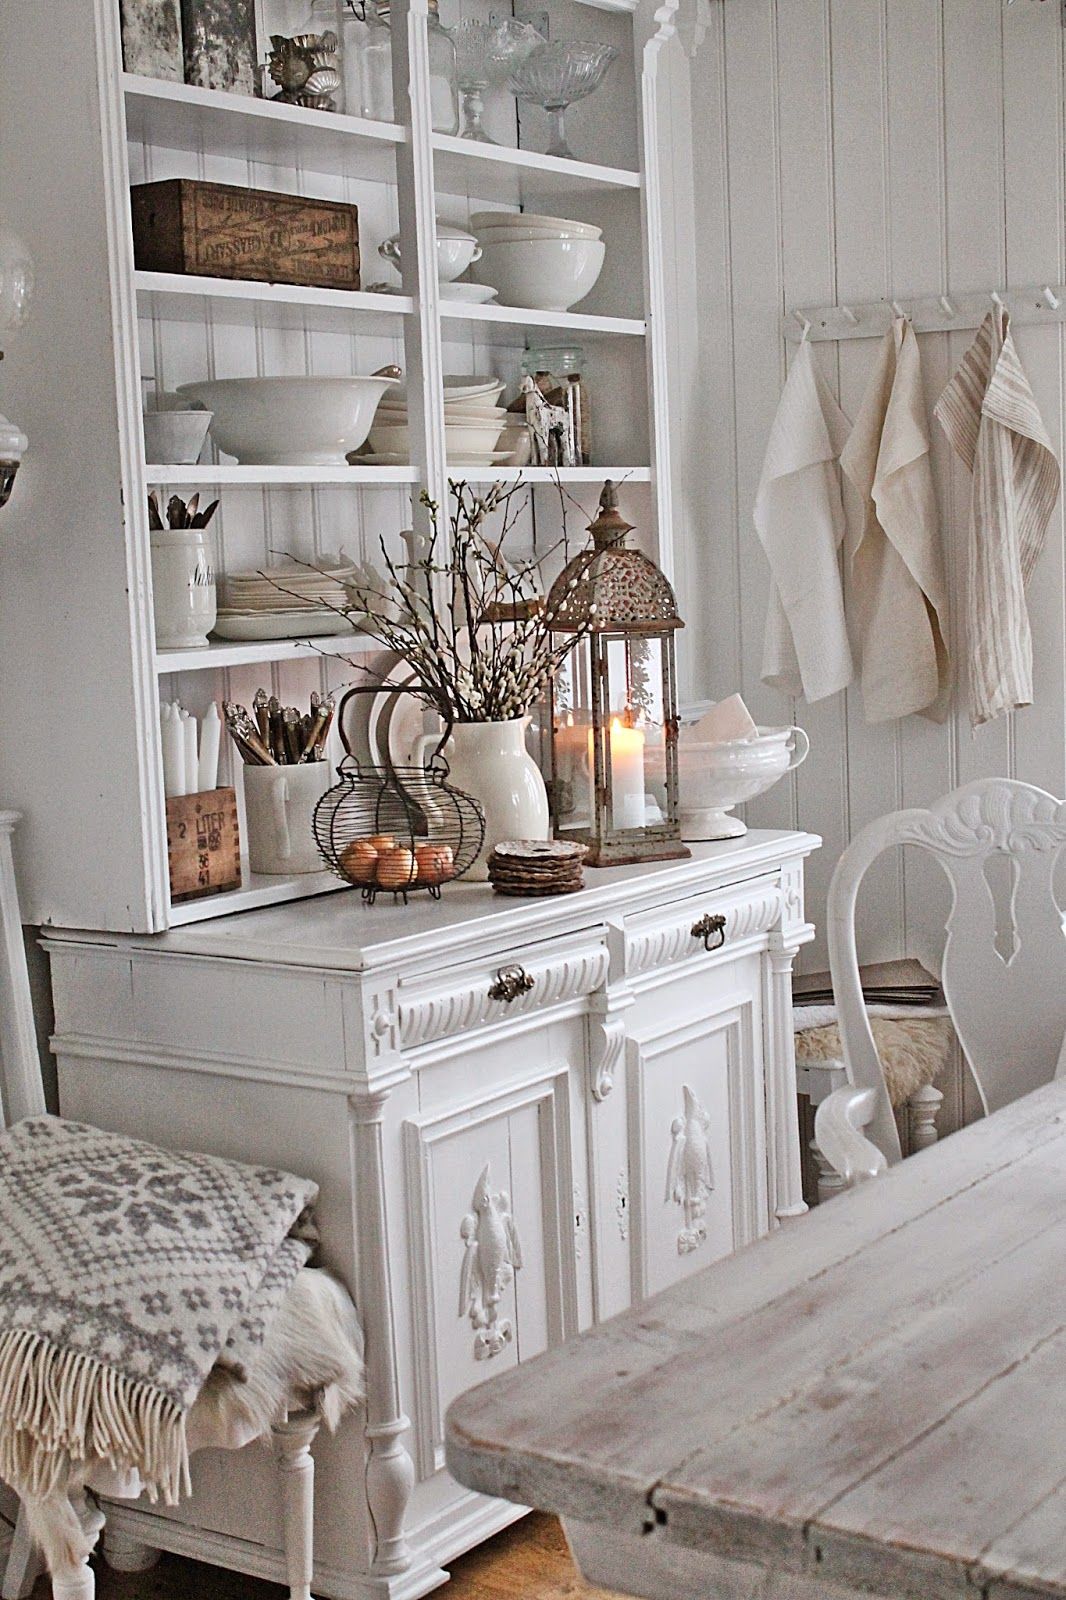 dekor/vesennii-dekor-svoimi-rukami-foto-7.jpg